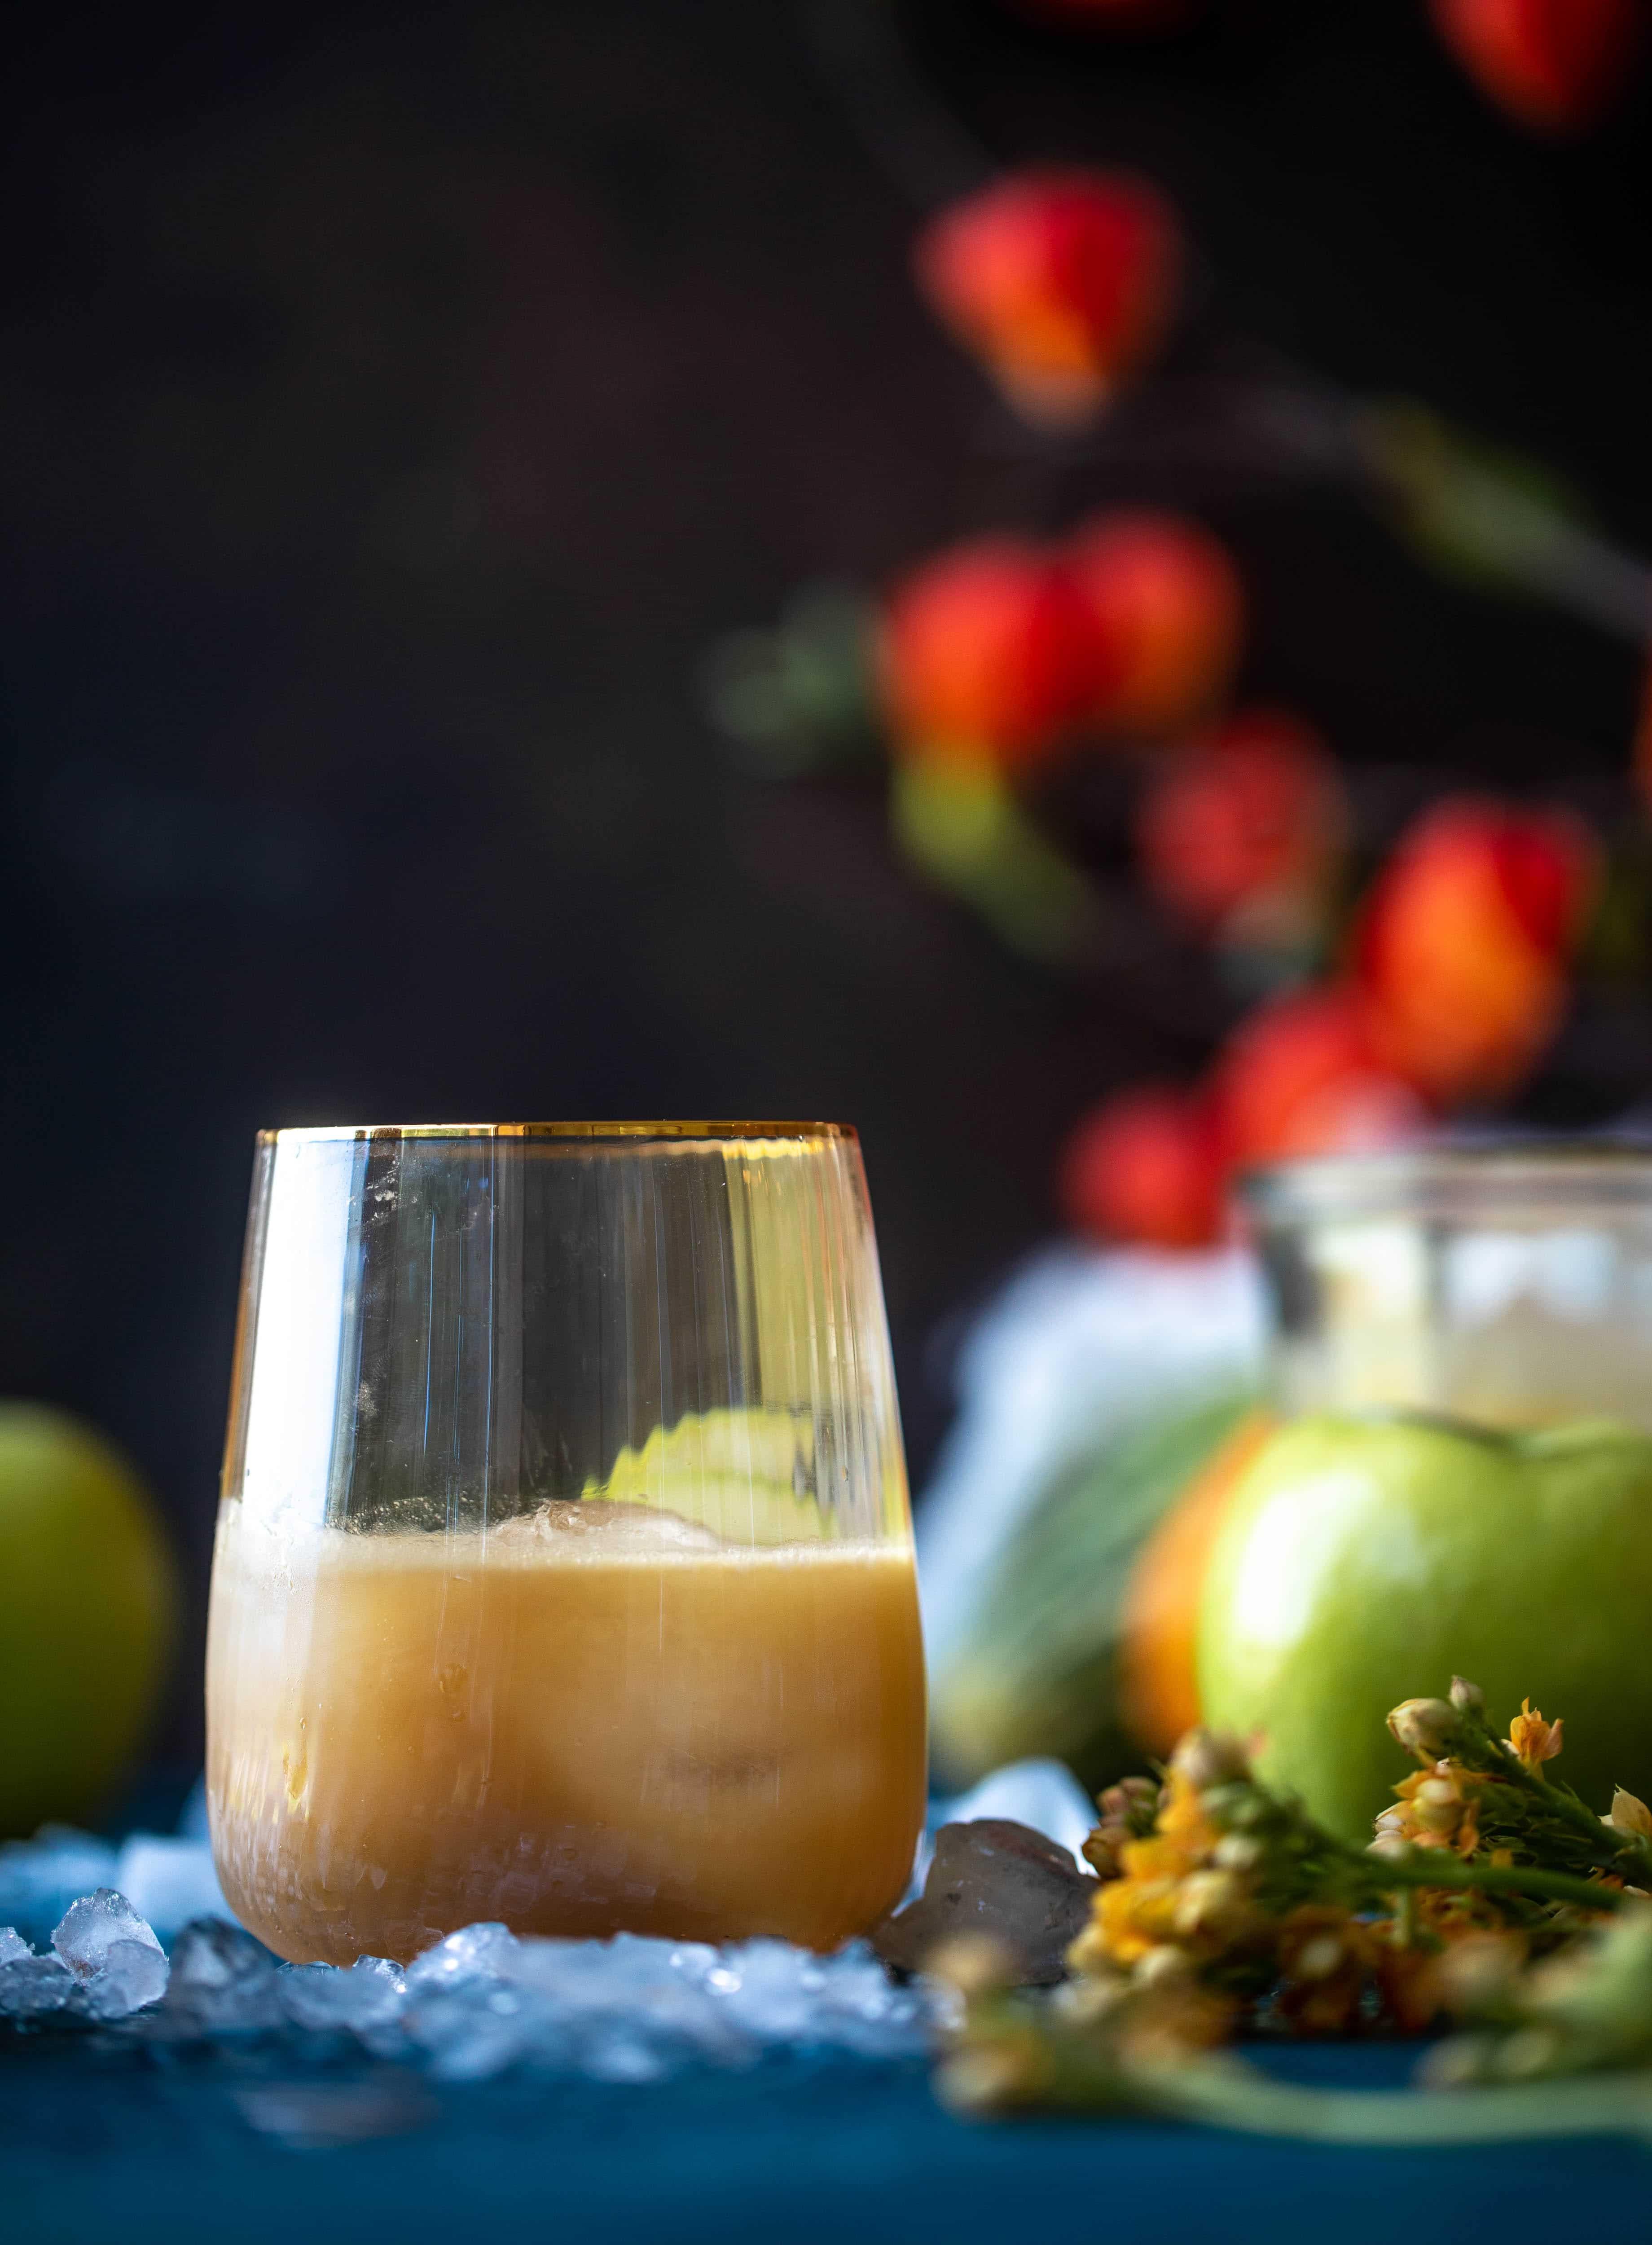 manzana caramelizada pasada de moda y 23 recetas perfectas de halloween